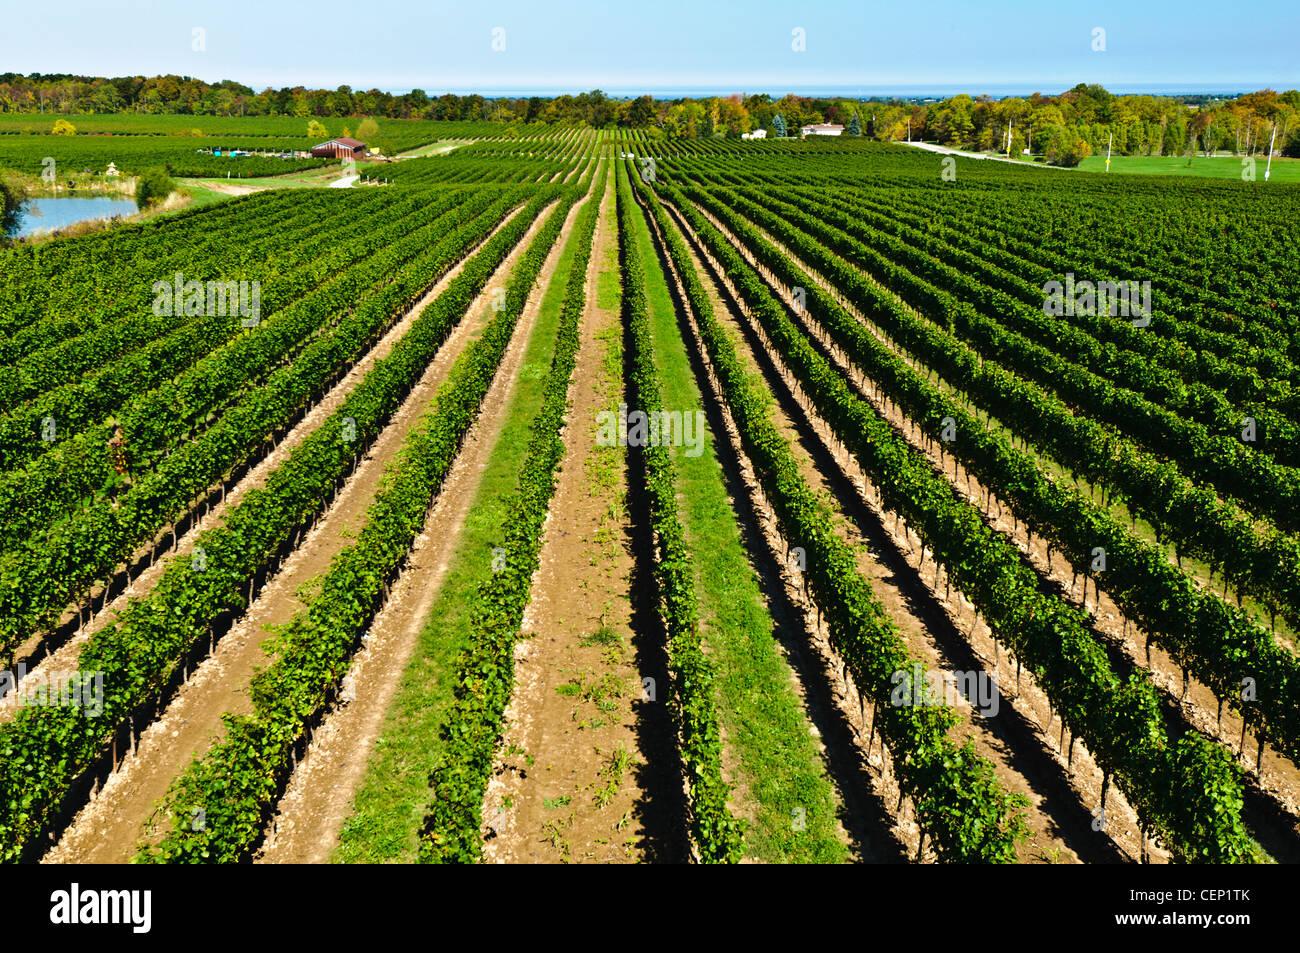 Vineyard in Niagara Wine Region, Ontario, Canada - Stock Image